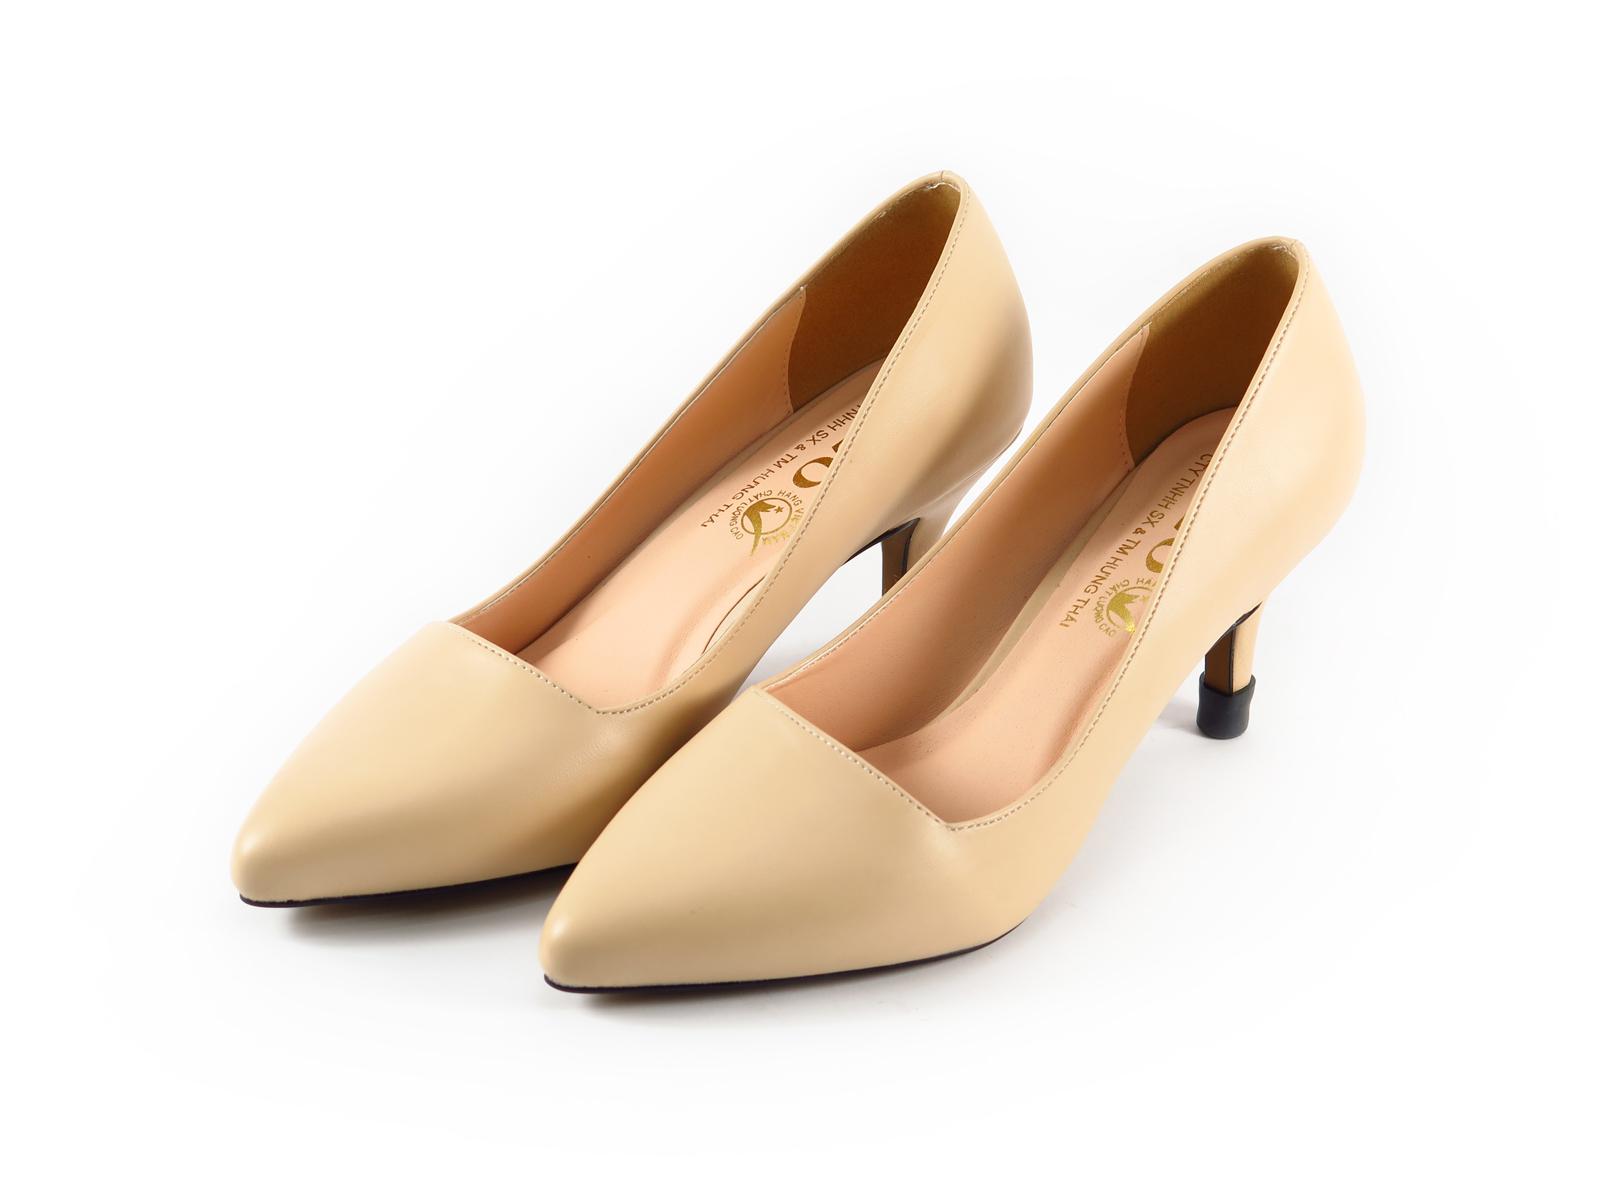 Giày cao gót nữ 5p